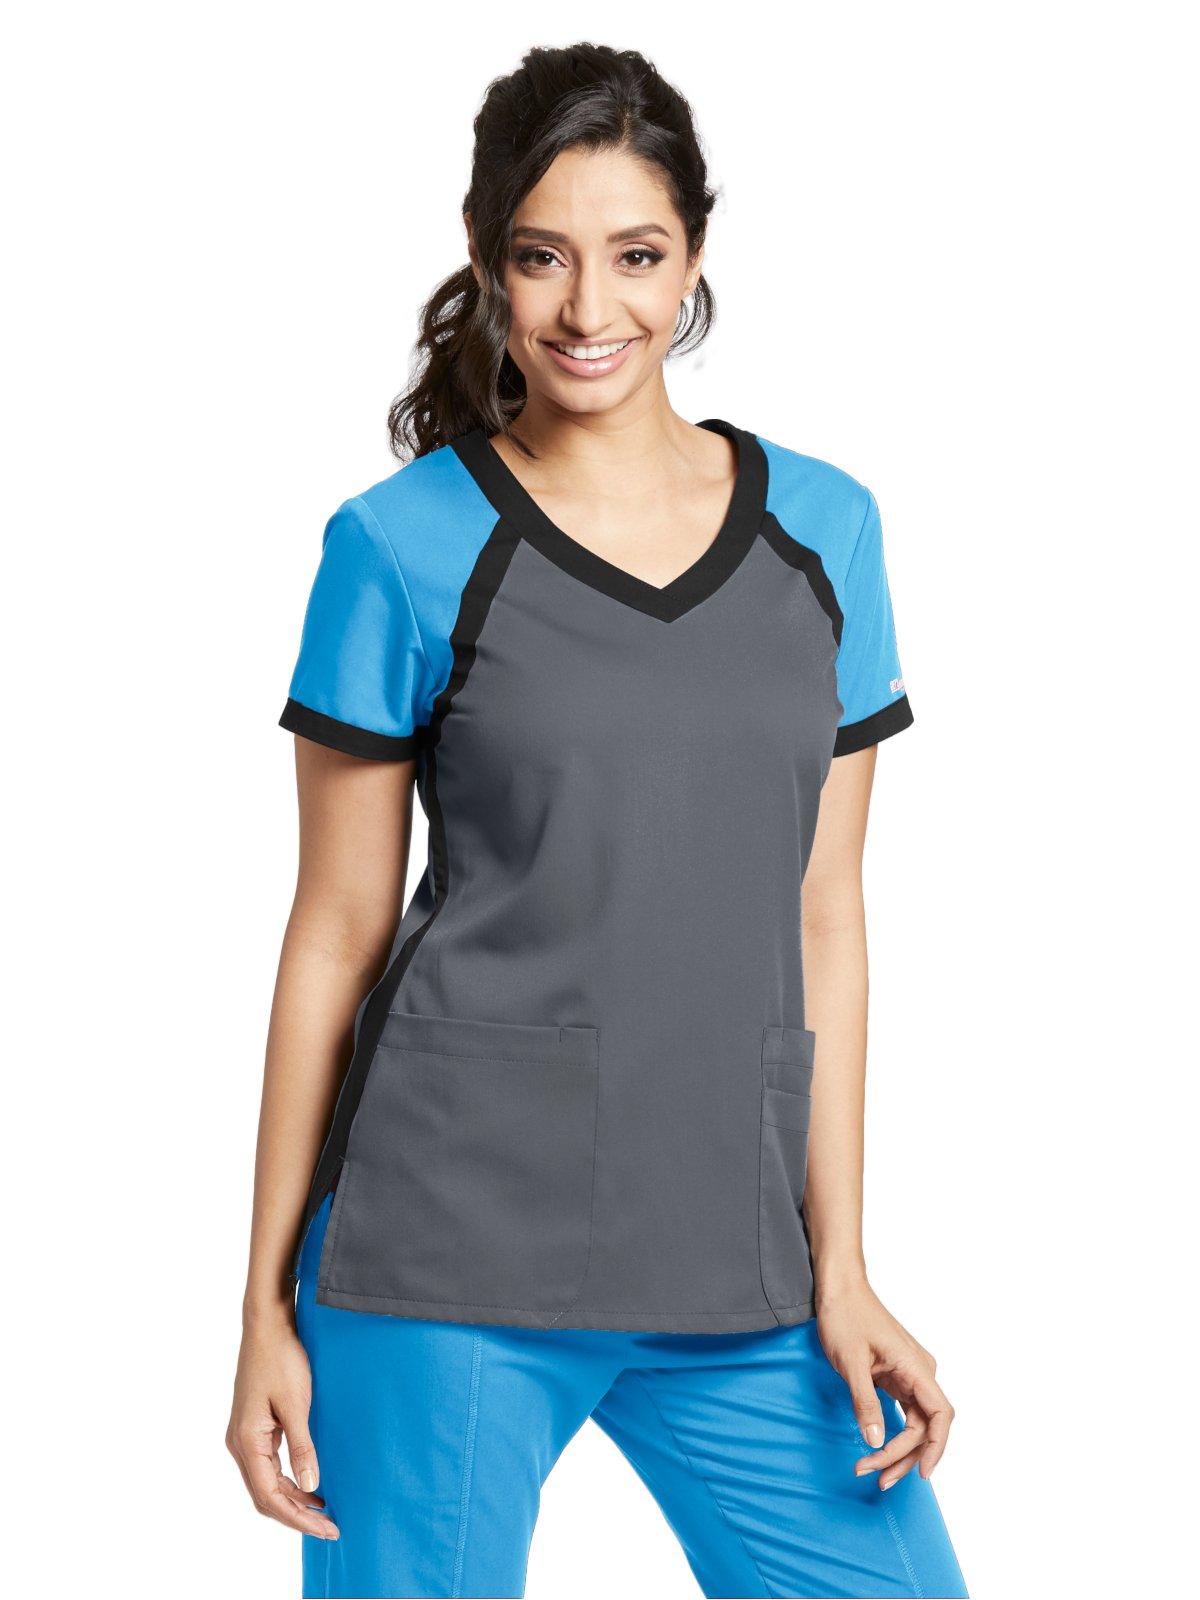 Grey's Anatomy Active 41435 Color Block V-Neck Top Steel/Iceberg/Black M